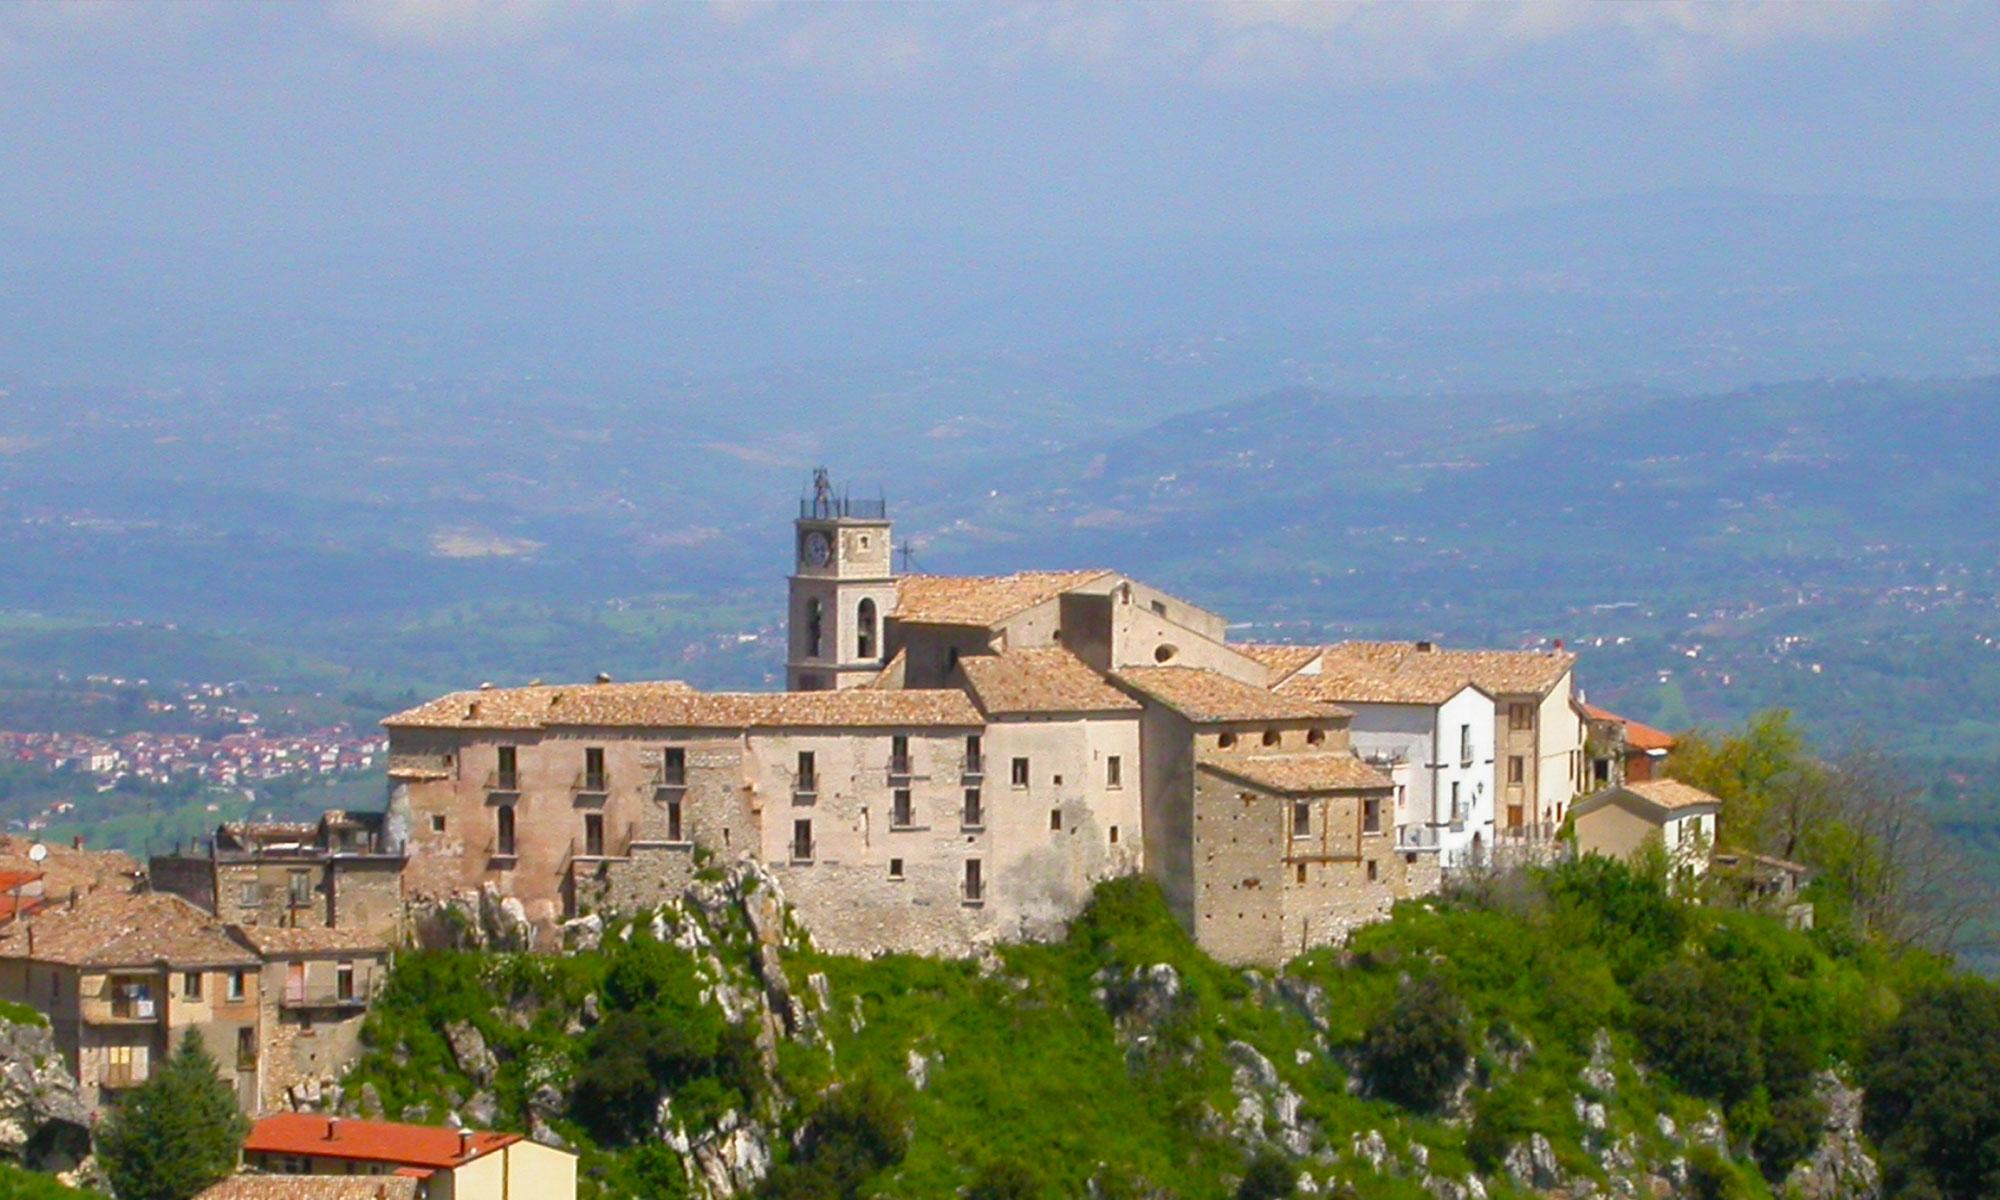 Borgo di Castelvetere